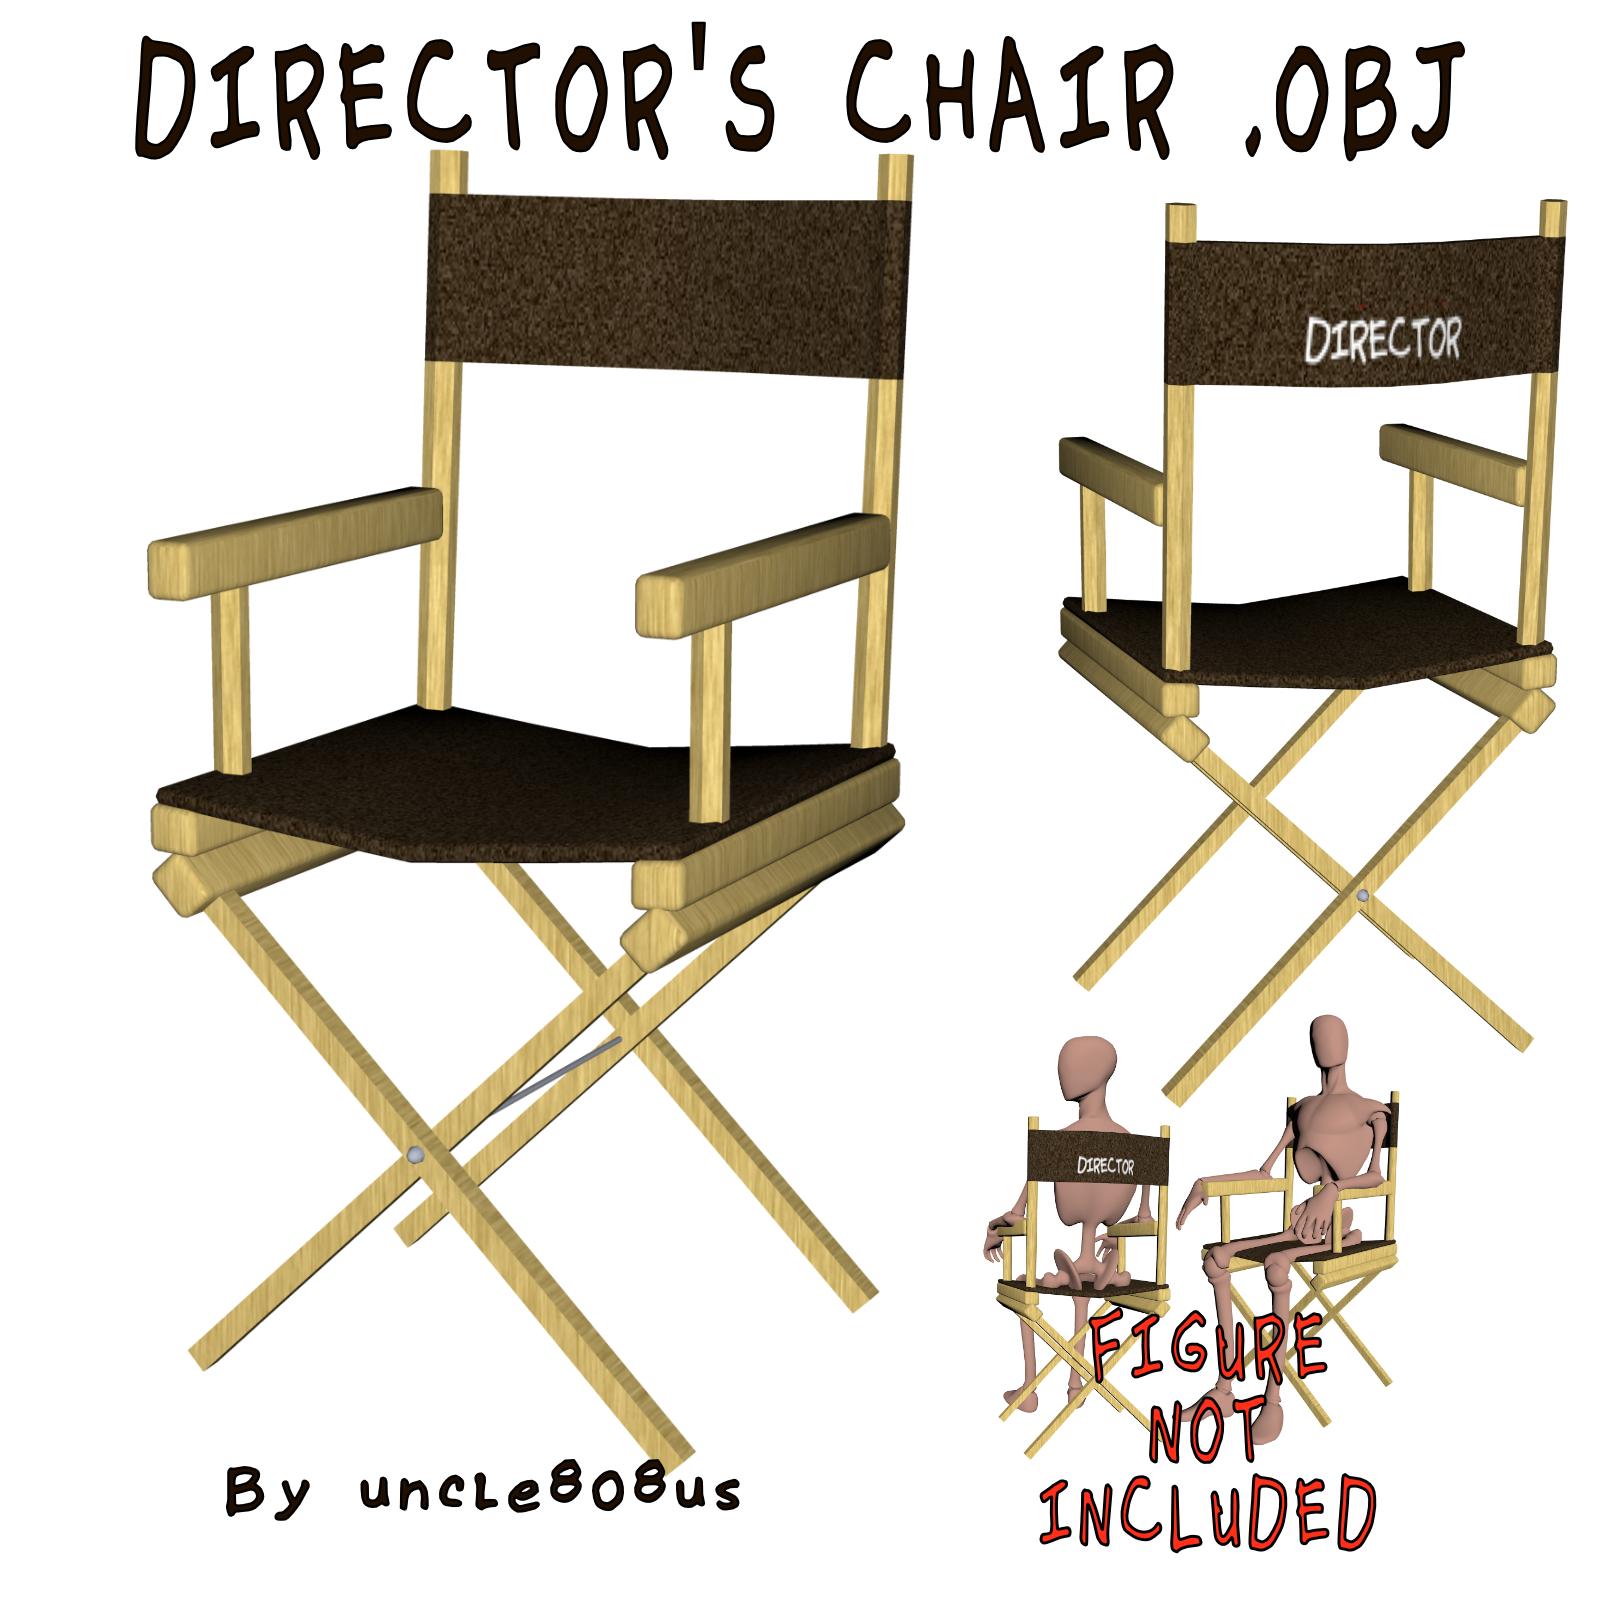 režisora krēsls 3d objekts 3d modelis cits obj 274165